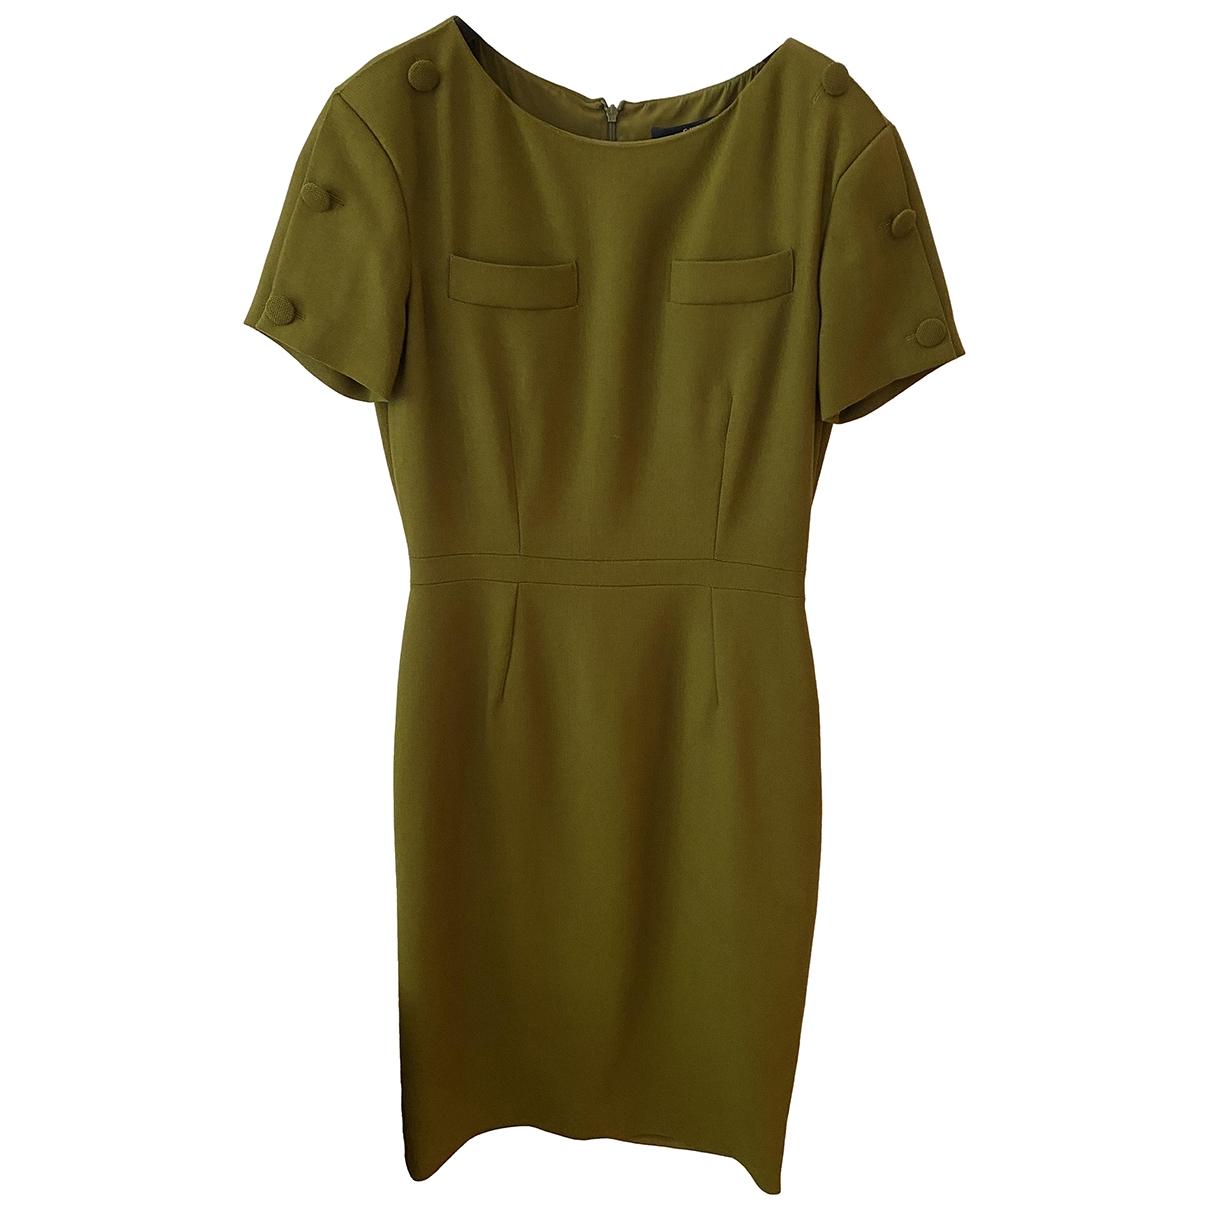 Gucci \N Khaki Wool dress for Women 38 FR